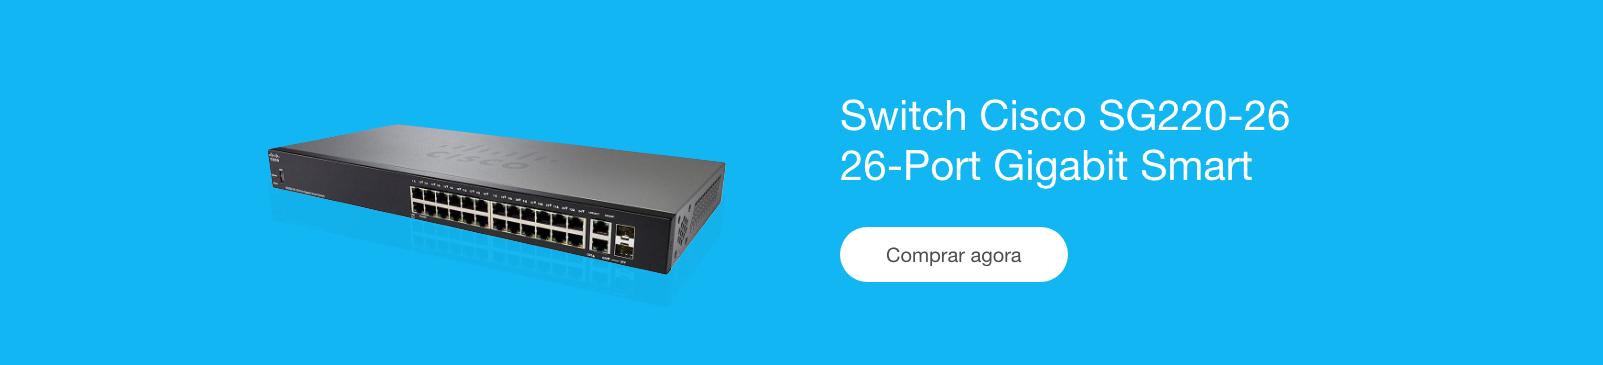 G220-26 26-Port